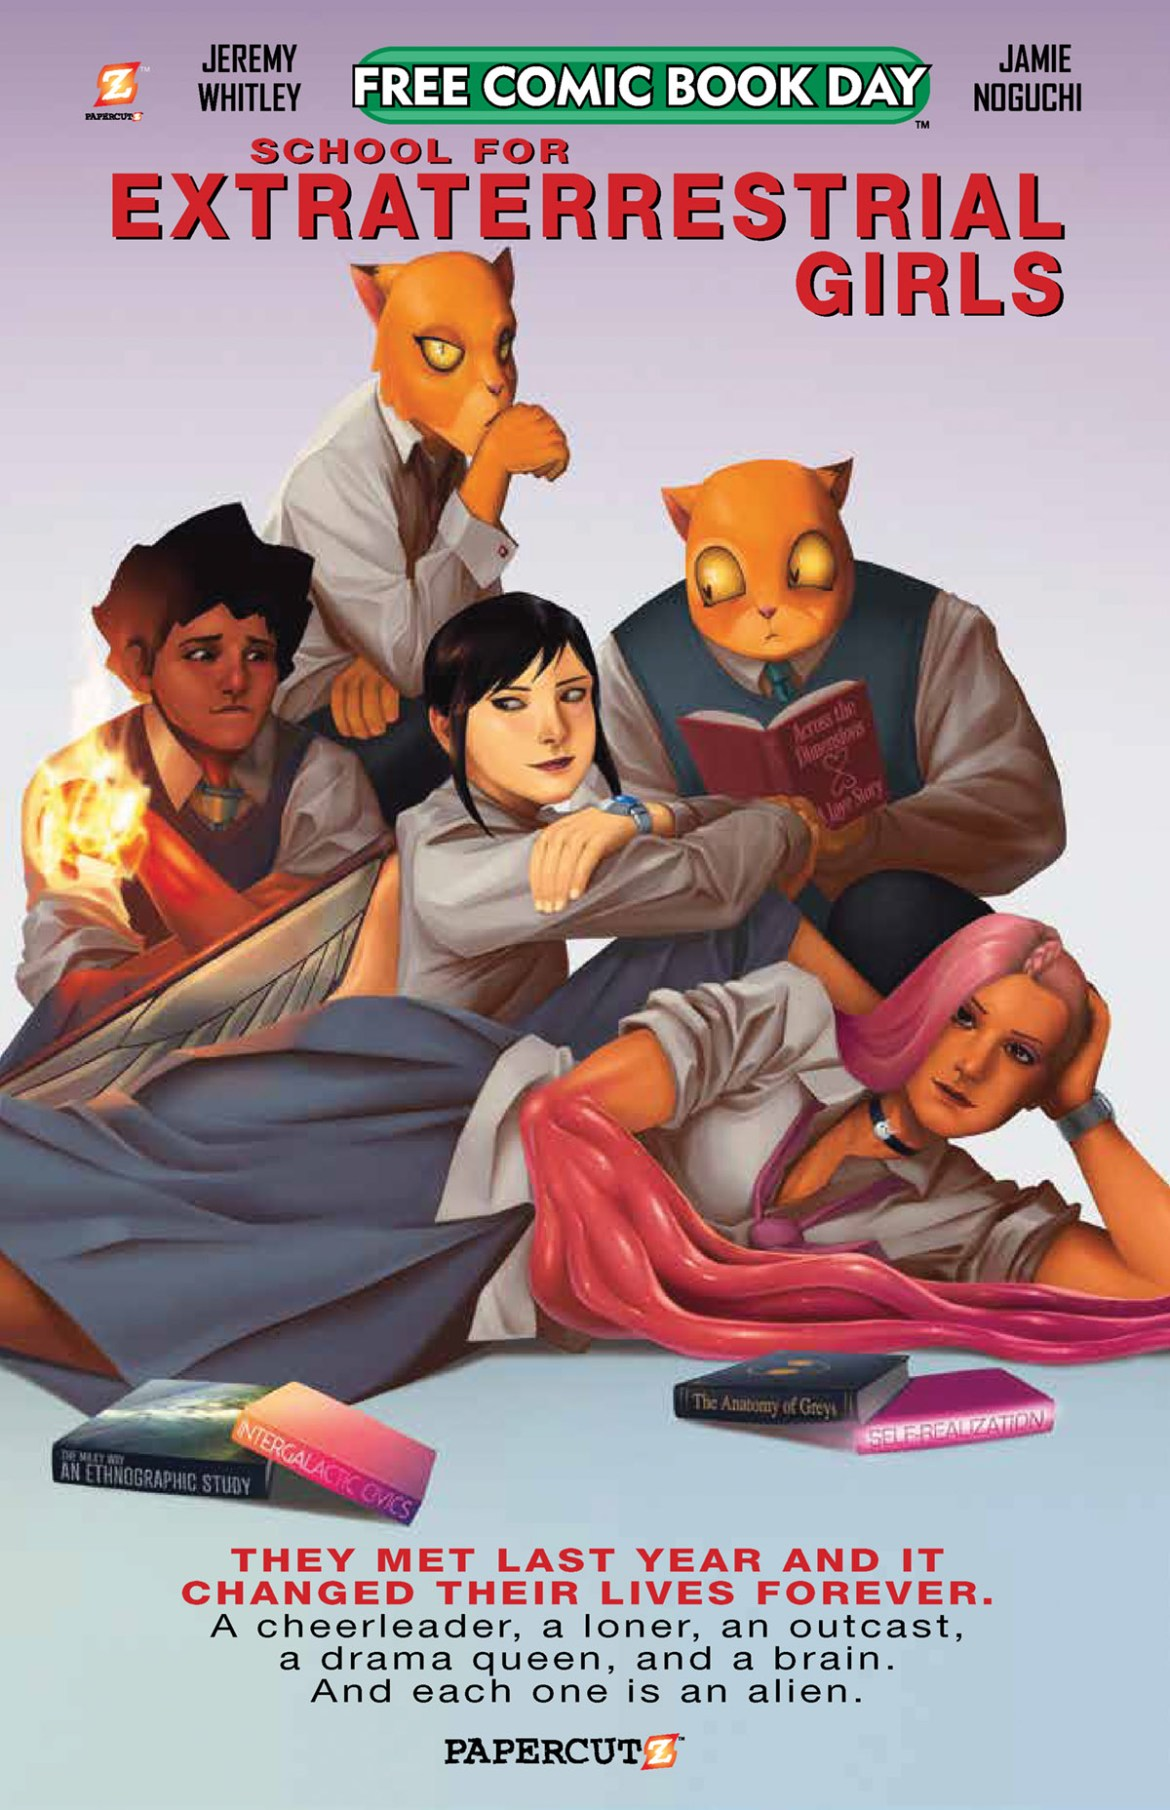 FCBD21_SILVER_Papercutz_School-for-E-T-Girls Complete Free Comic Book Day 2021 comic book line-up announced